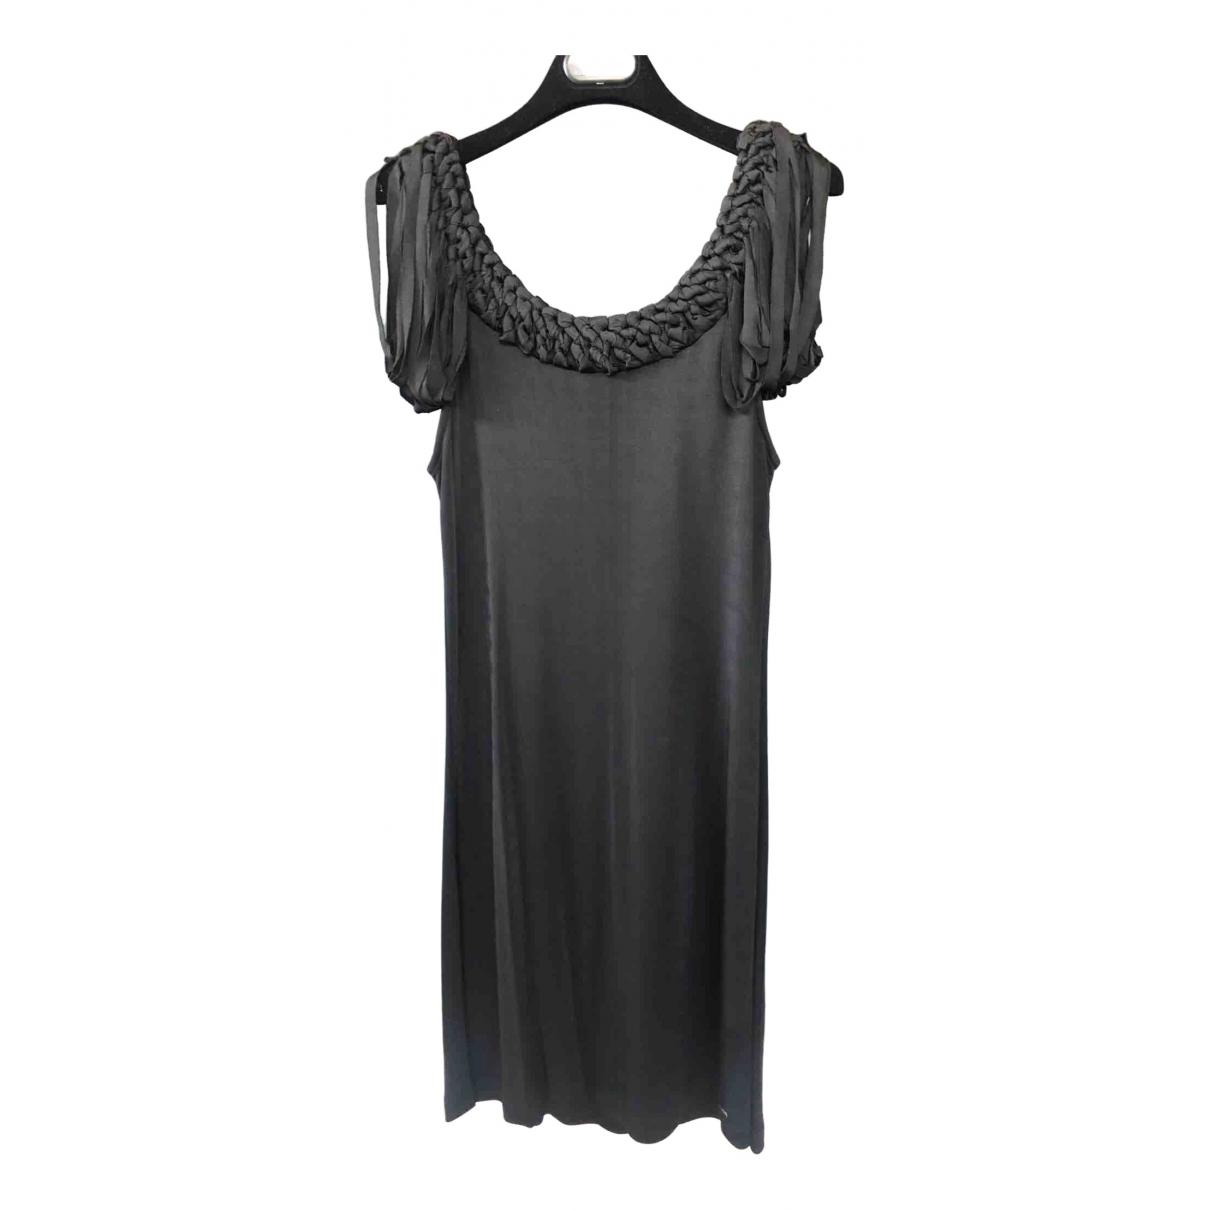 Guess \N Black dress for Women S International